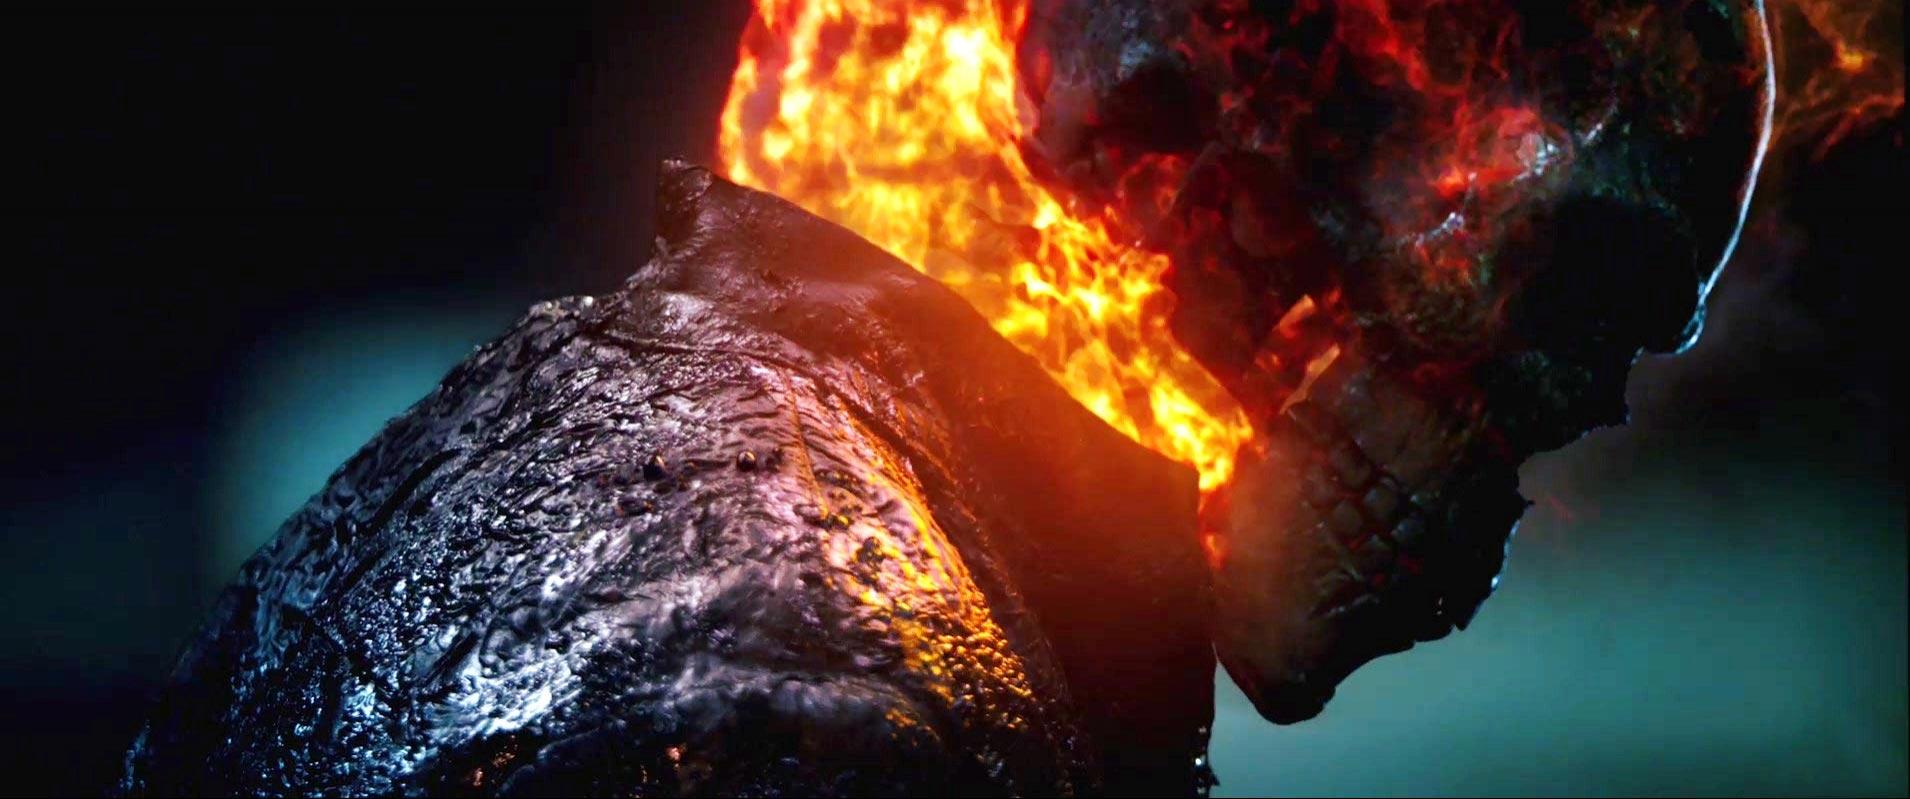 Ghost Rider 2 Movie In Hindi Avi